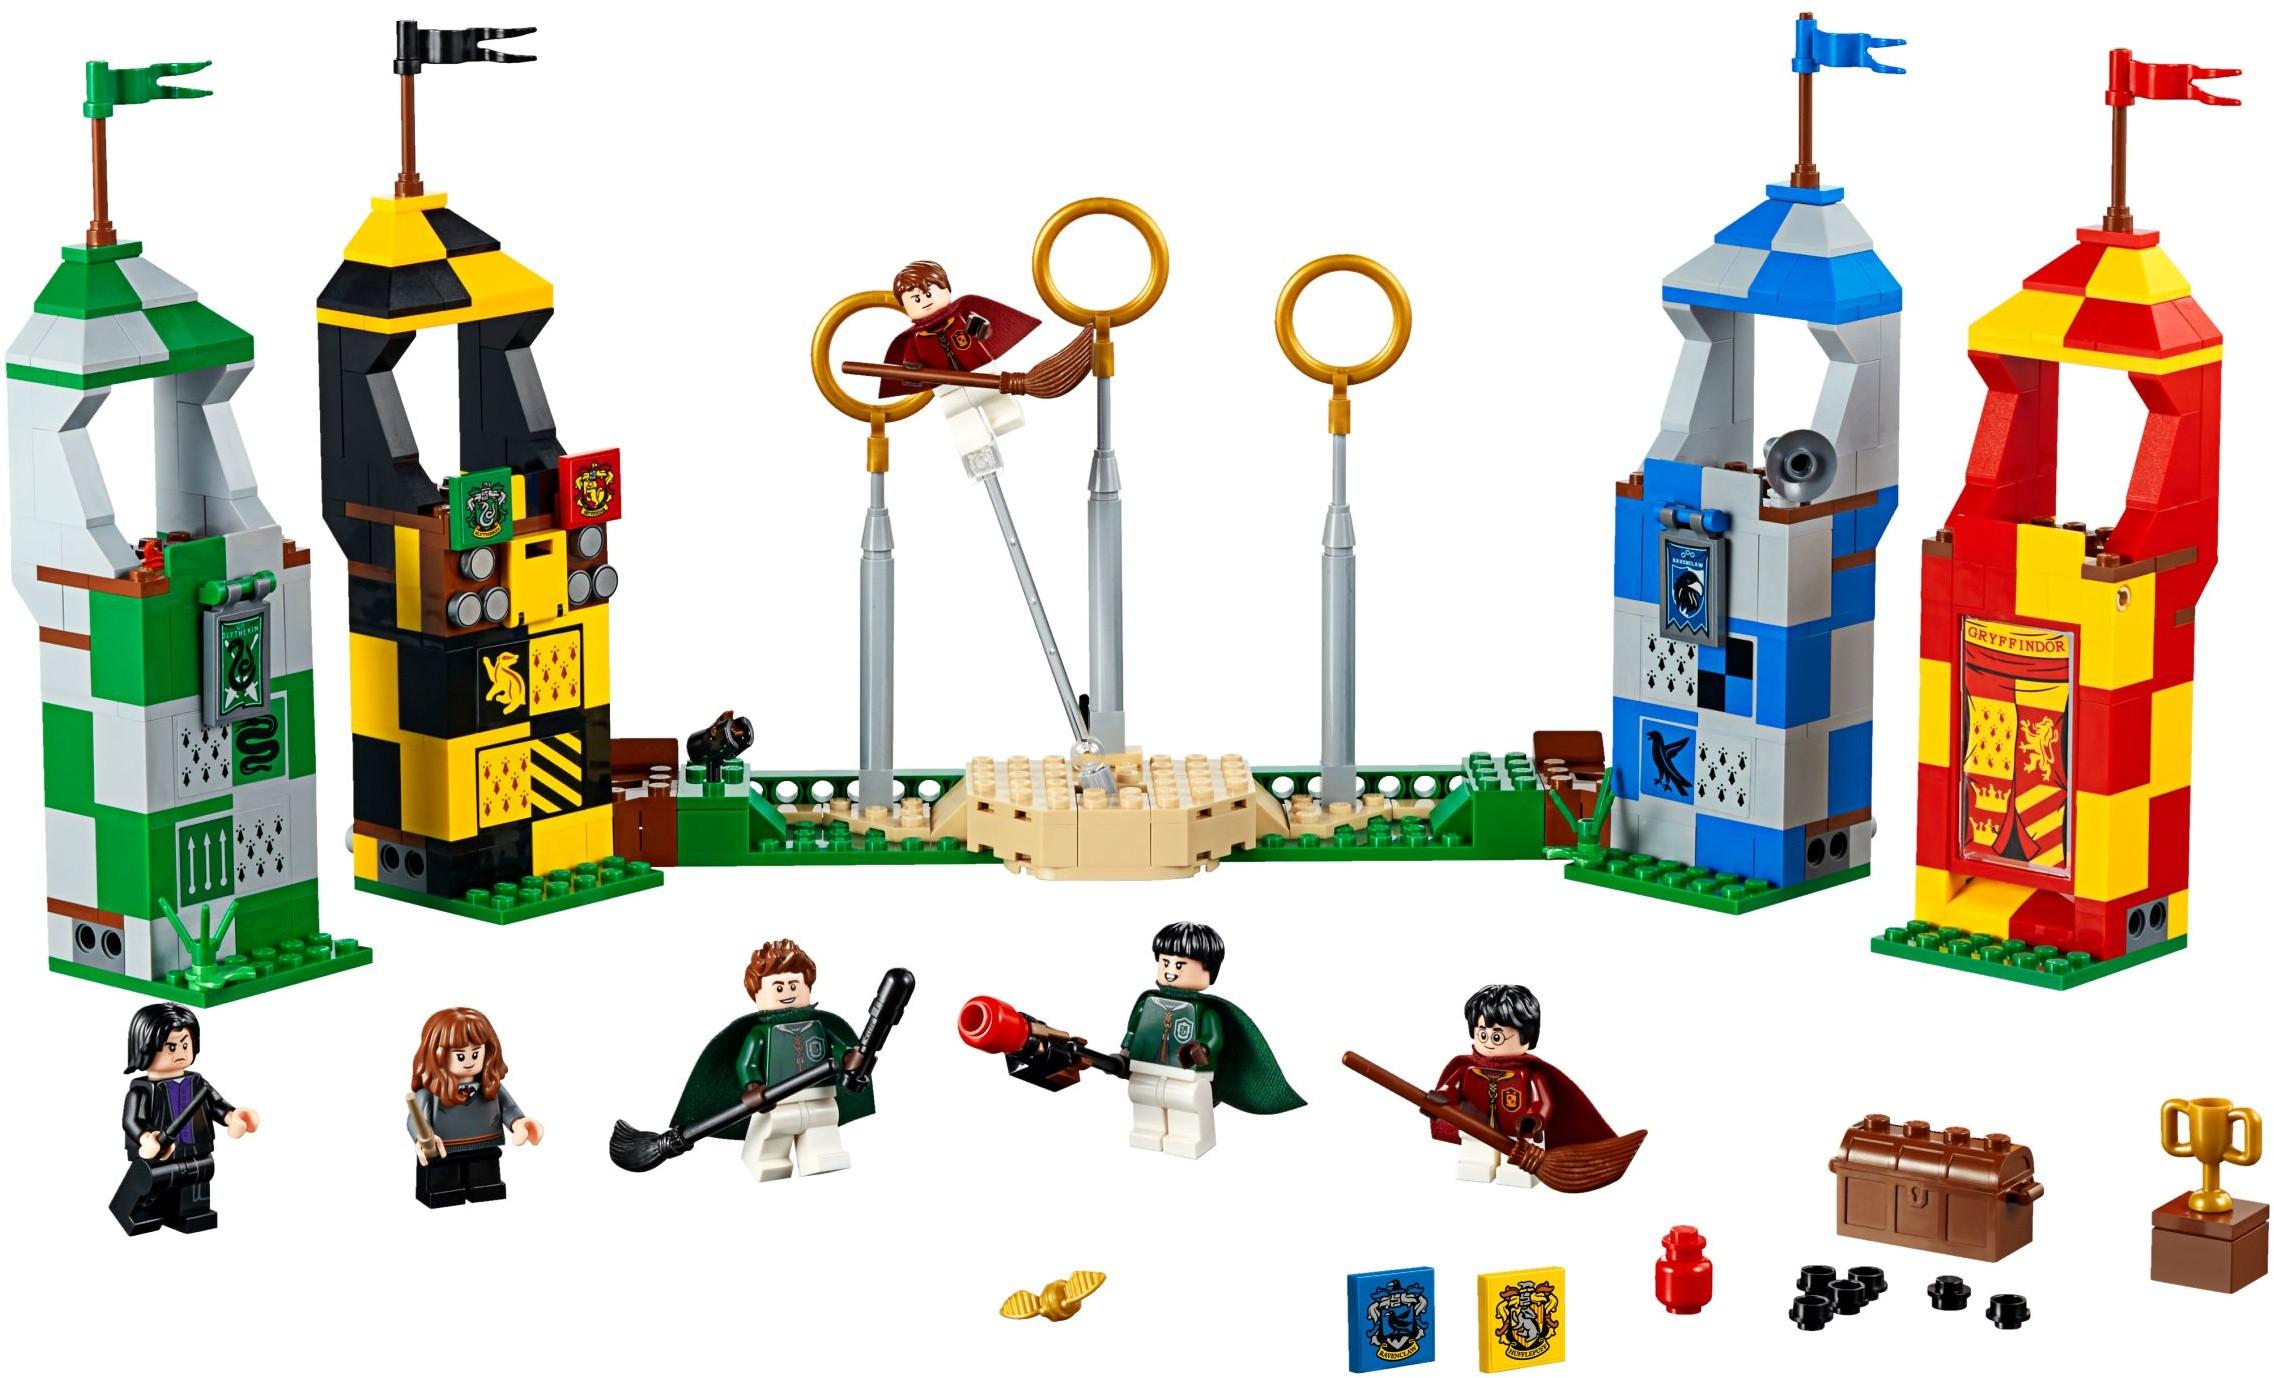 ab6ac9c5a Quidditch Match. 75956-1 Harry Potter ...